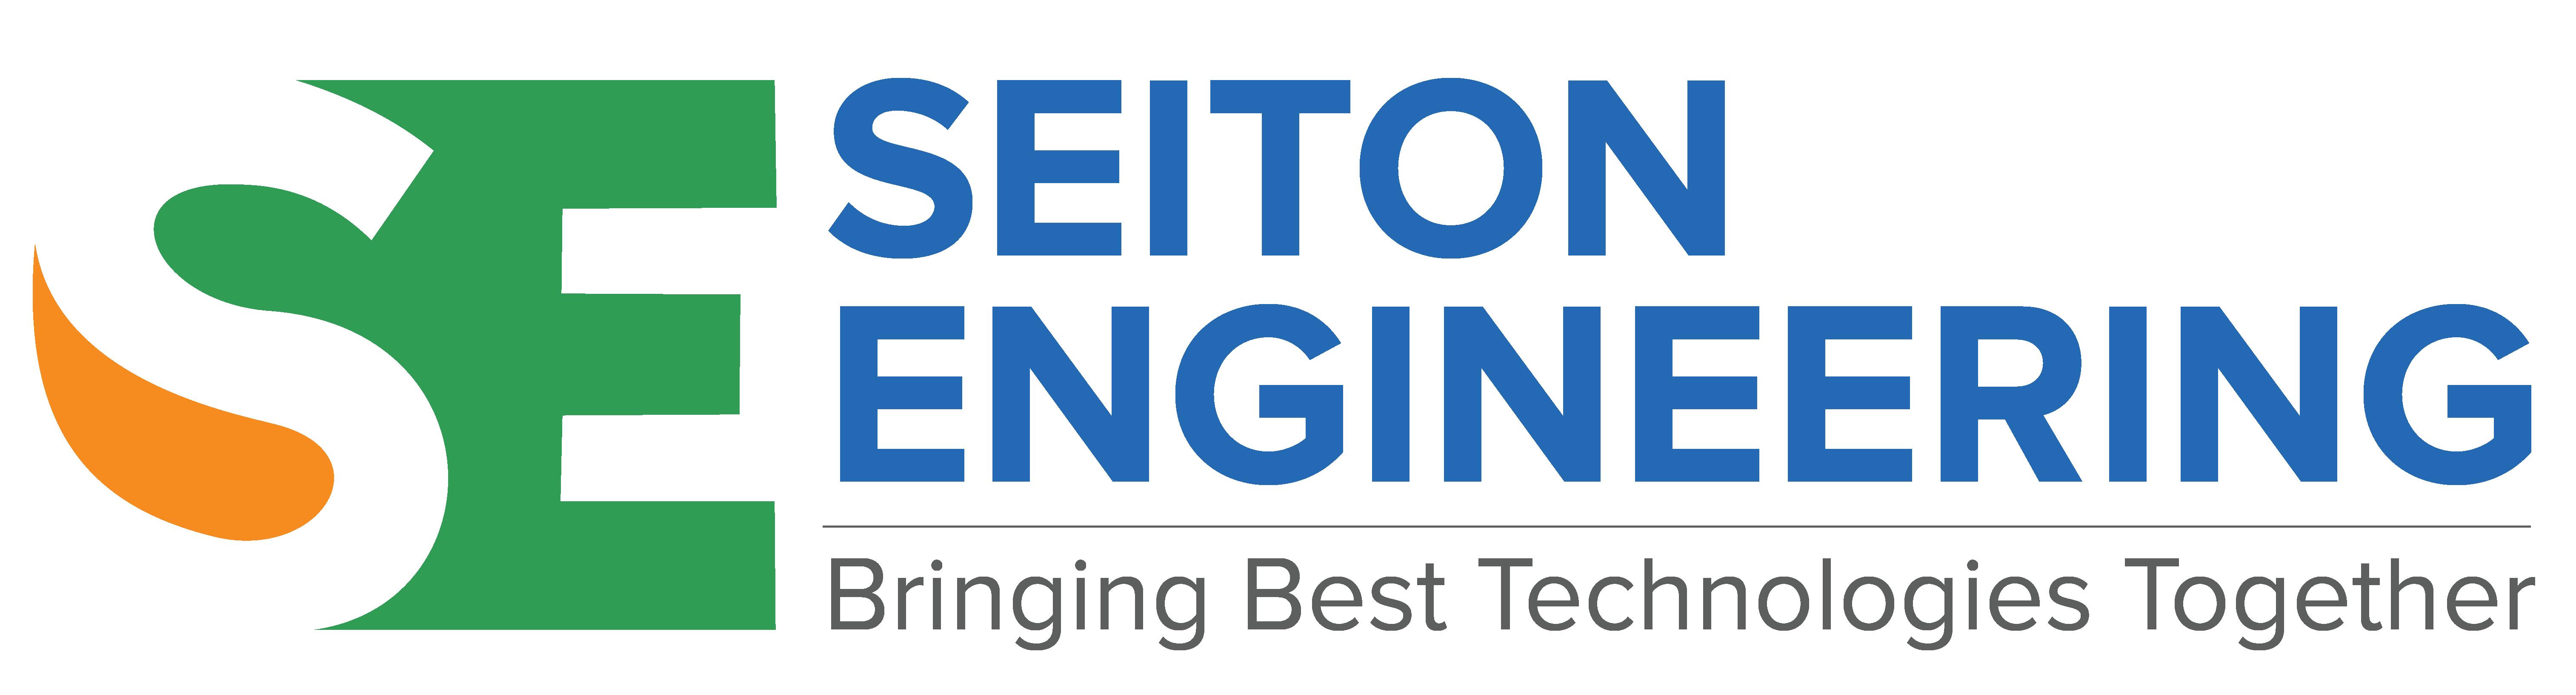 SEITON-LOGO-01